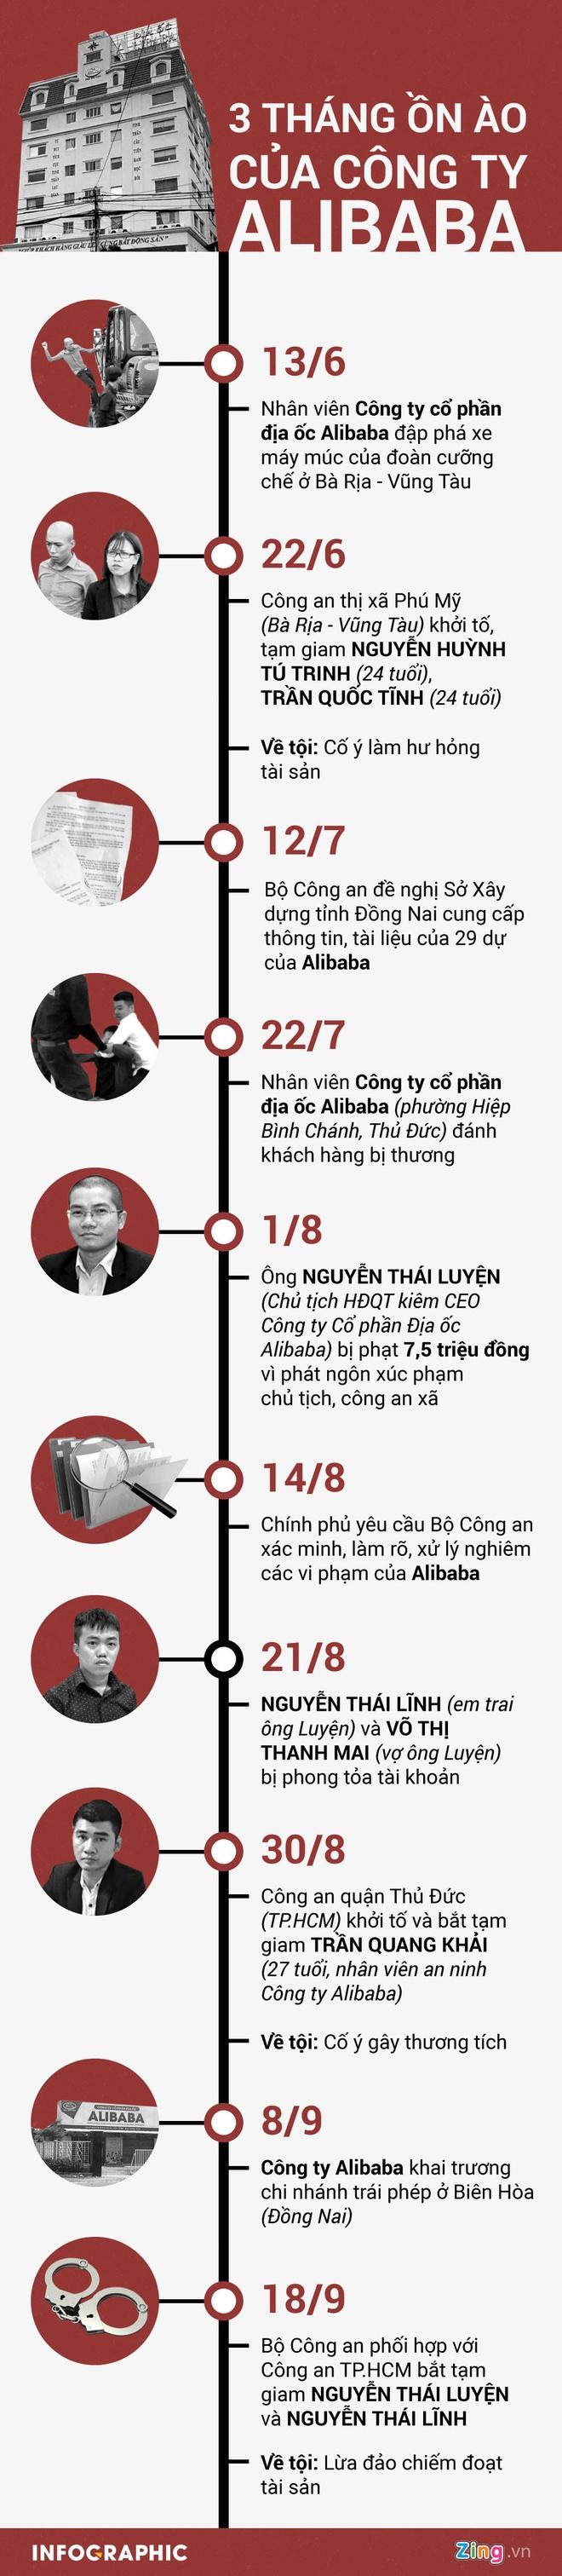 Nhan vien cua Alibaba co vo can khi Nguyen Thai Luyen bi bat? hinh anh 2